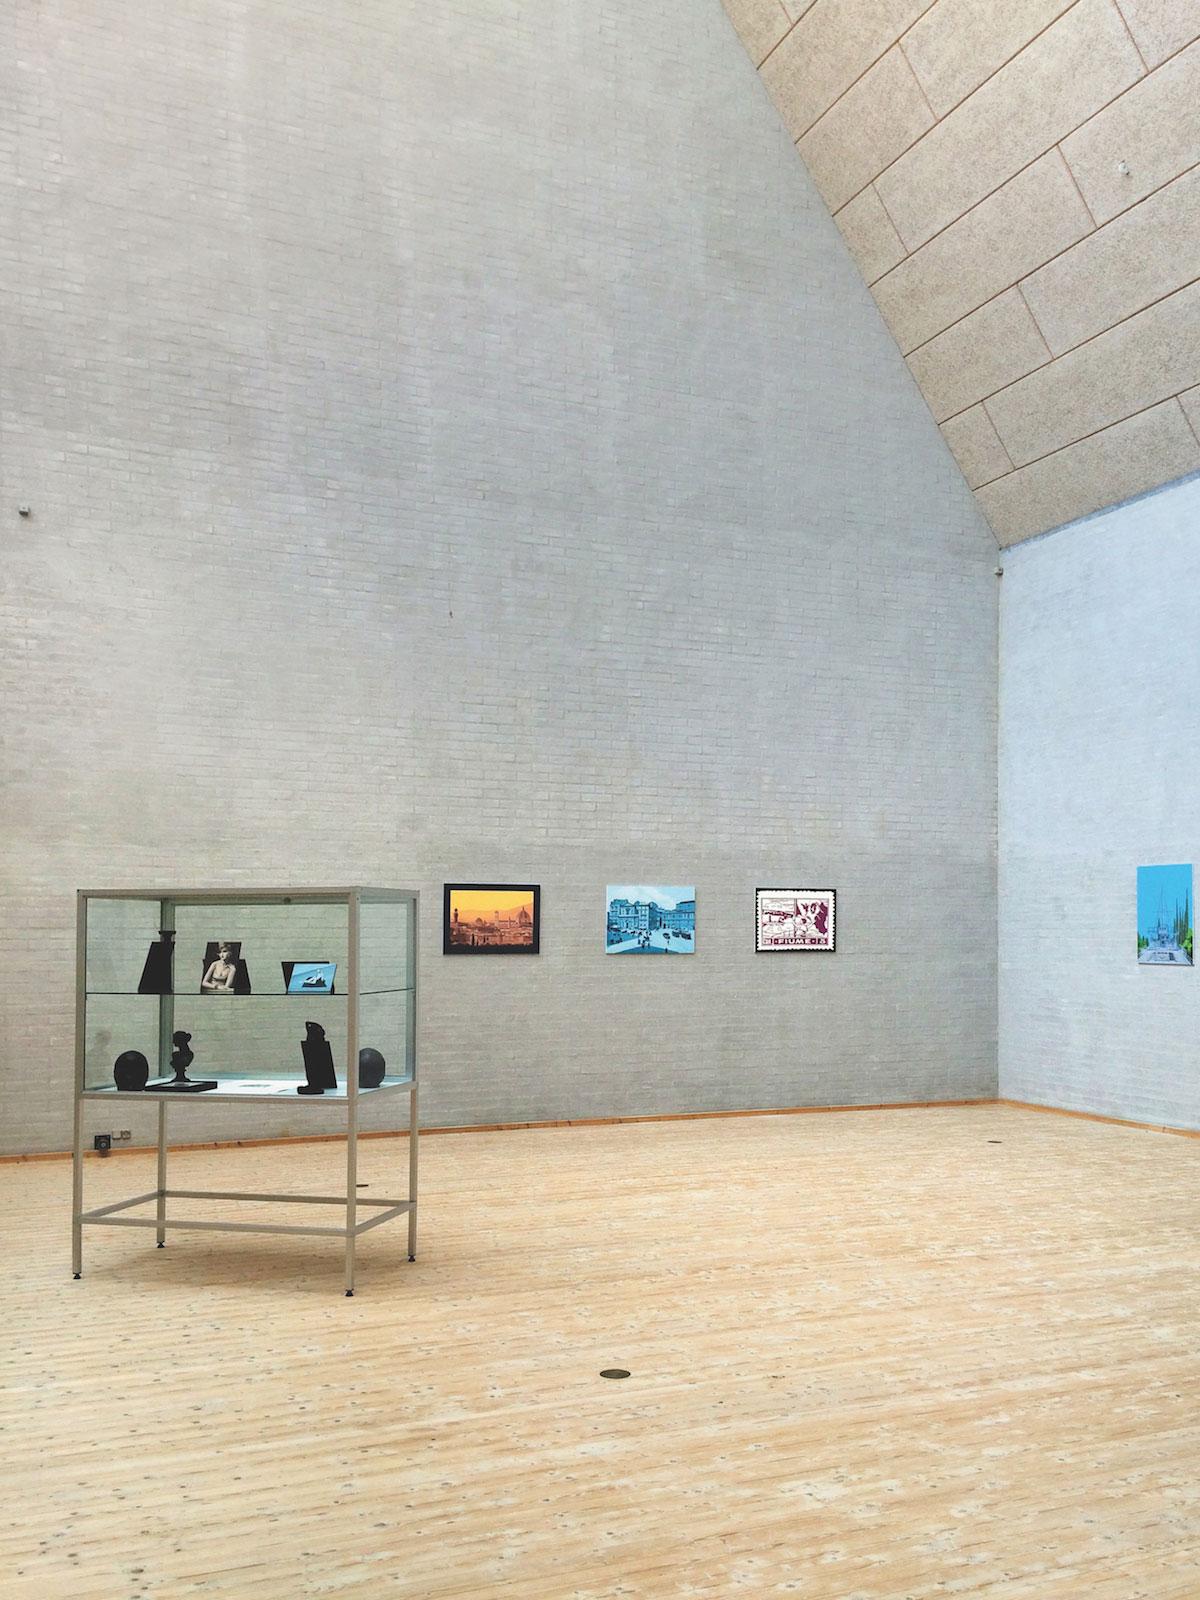 Johan Furåker, Installation view, Kunstcenter Aars 2016